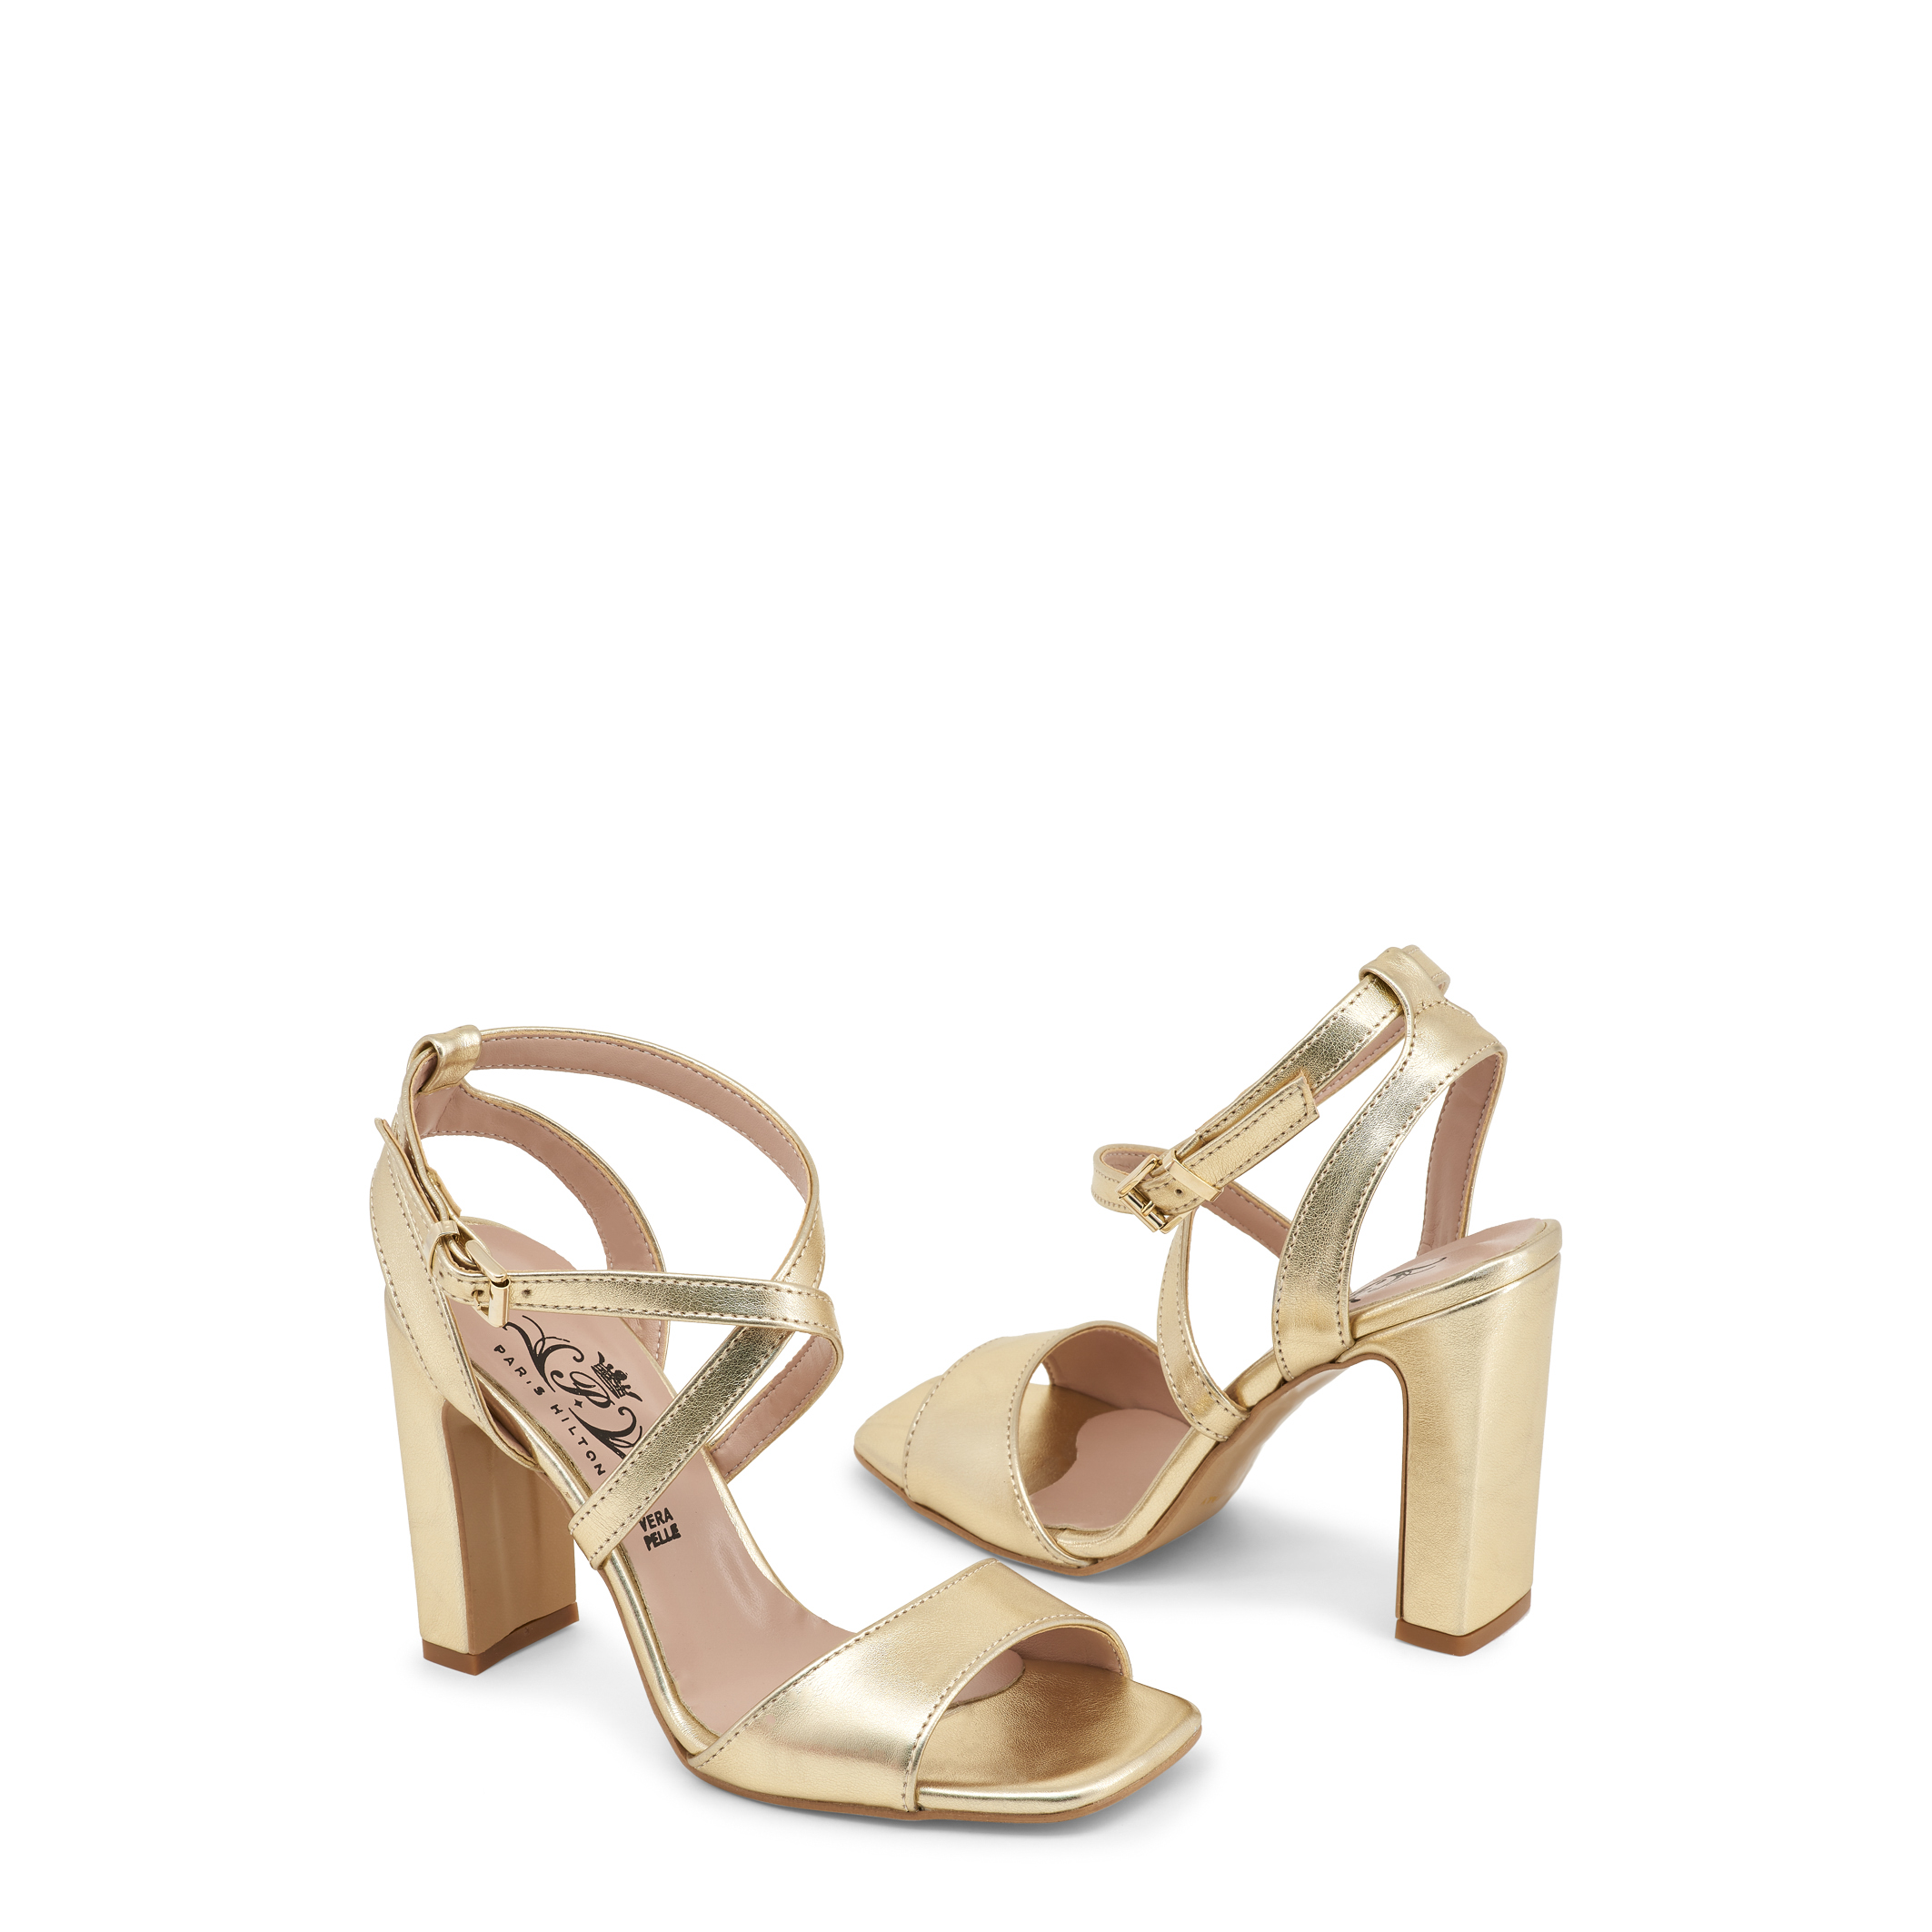 Paris Hilton Schuhe 1519, Violett/Grau/Gelb Damen Sandalette Violett/Grau/Gelb 1519, Keilabsatz e26b52